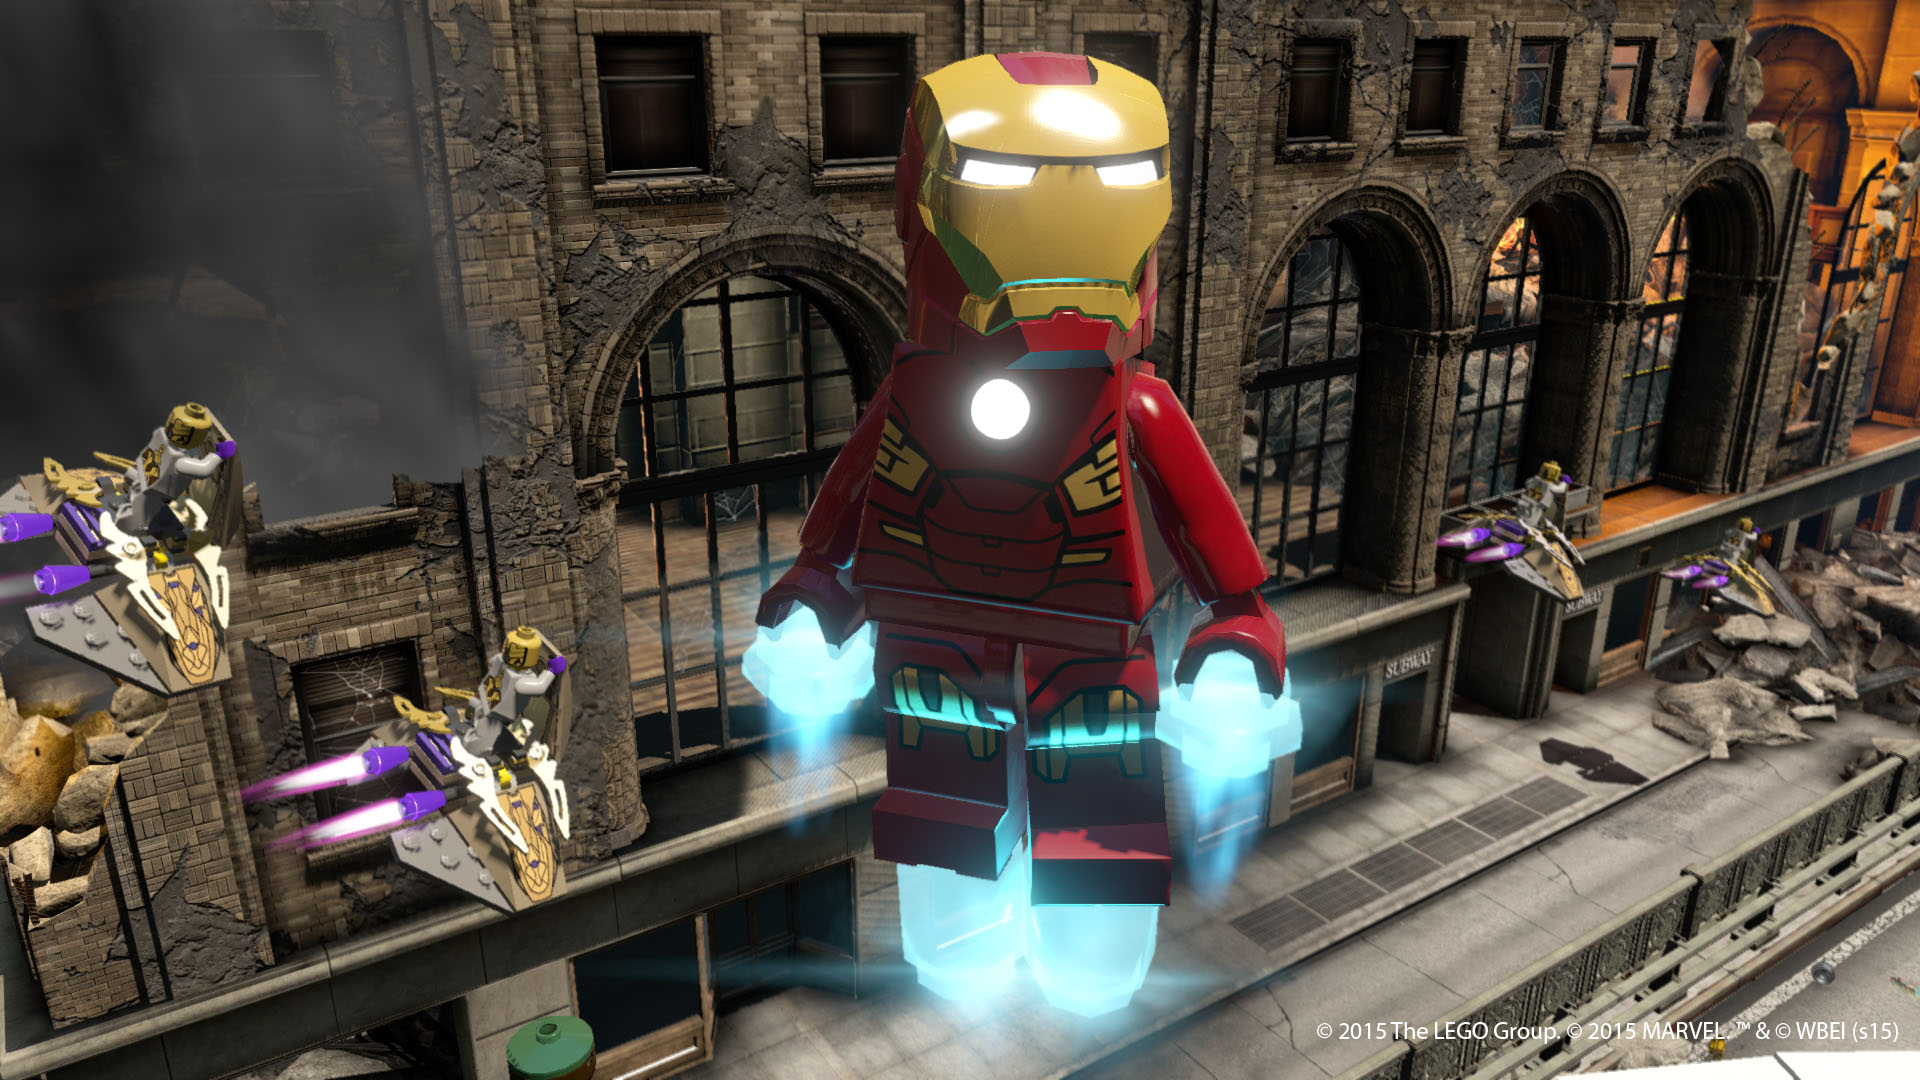 LEGO_Marvels_Avengers_E3_2015_IronMan_1434442066